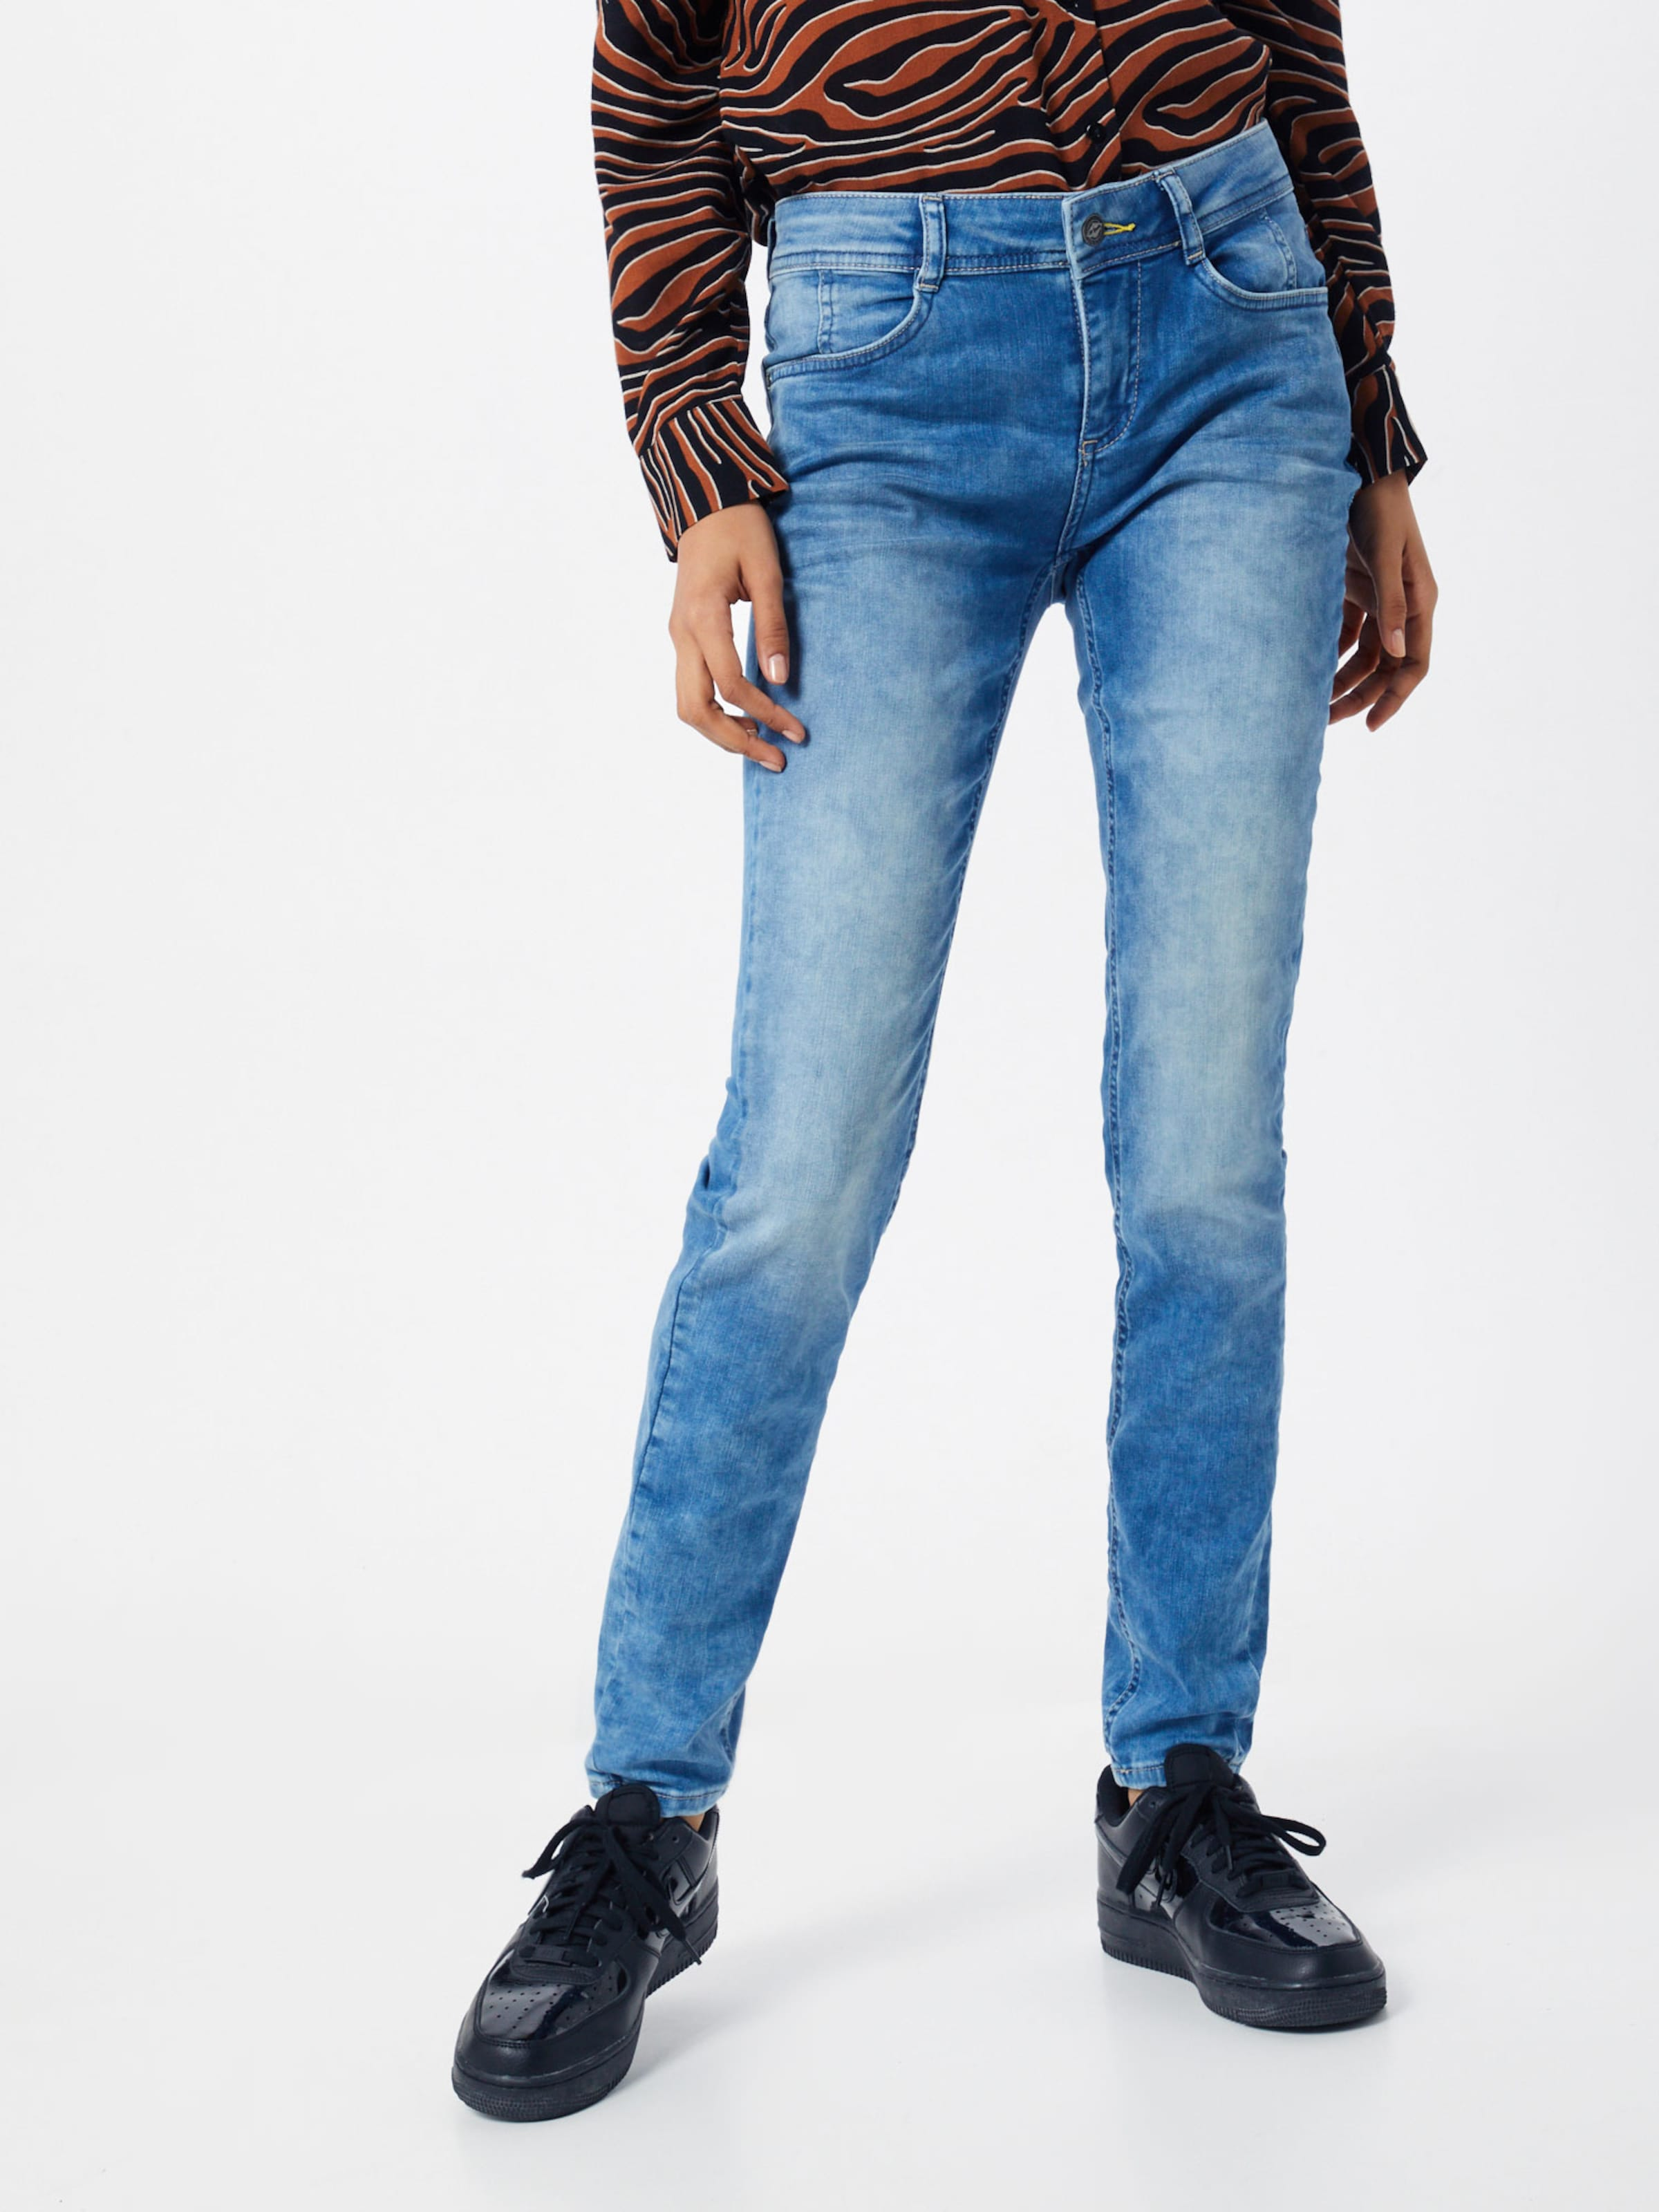 Blue Jeans Street In Denim One 'yorkSlimfit' FKcTJl31